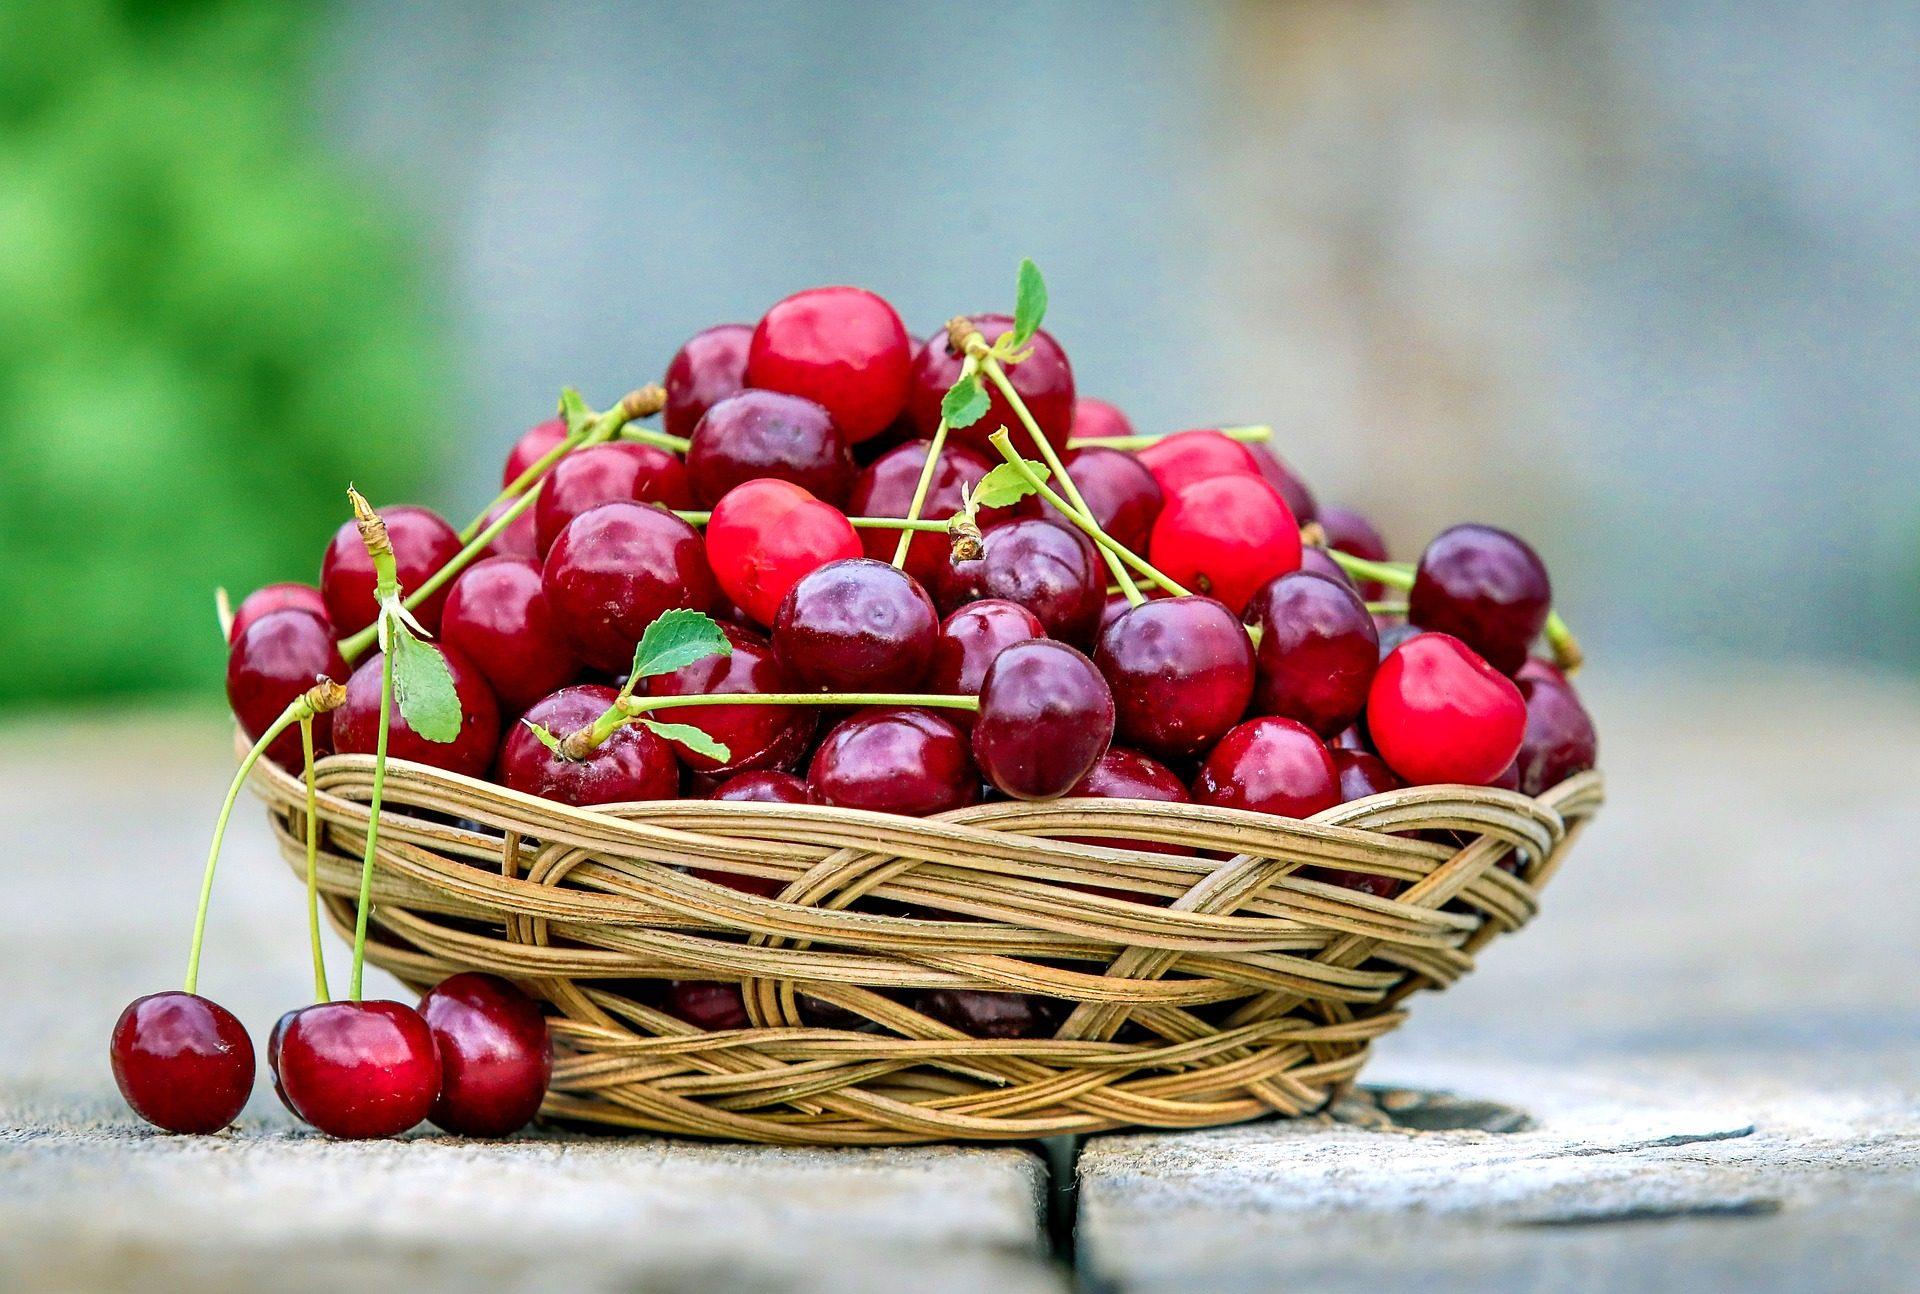 cerezas, picotas, fruta, cesto, canasta, mimbre - Fondos de Pantalla HD - professor-falken.com